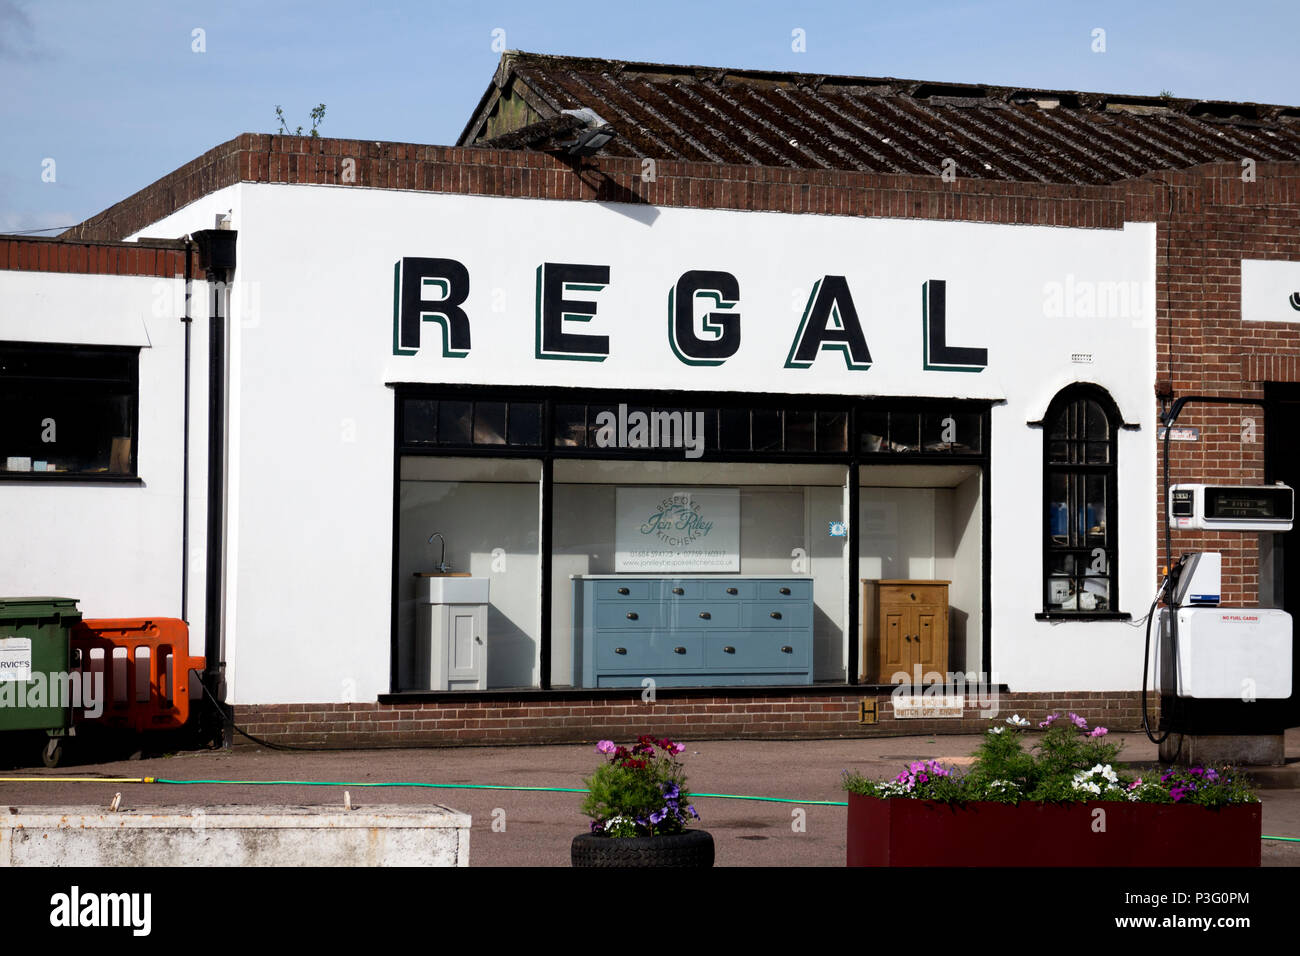 The Regal Garage Upton Upon Severn Worcestershire England Uk